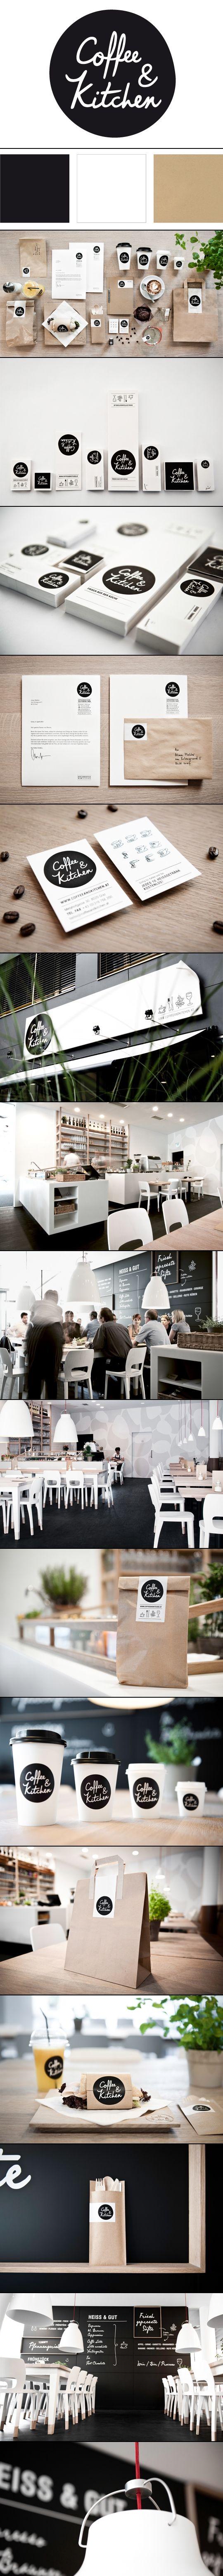 identity / Coffee & Kitchen | Moodley Brand Identity #design #branding #identity